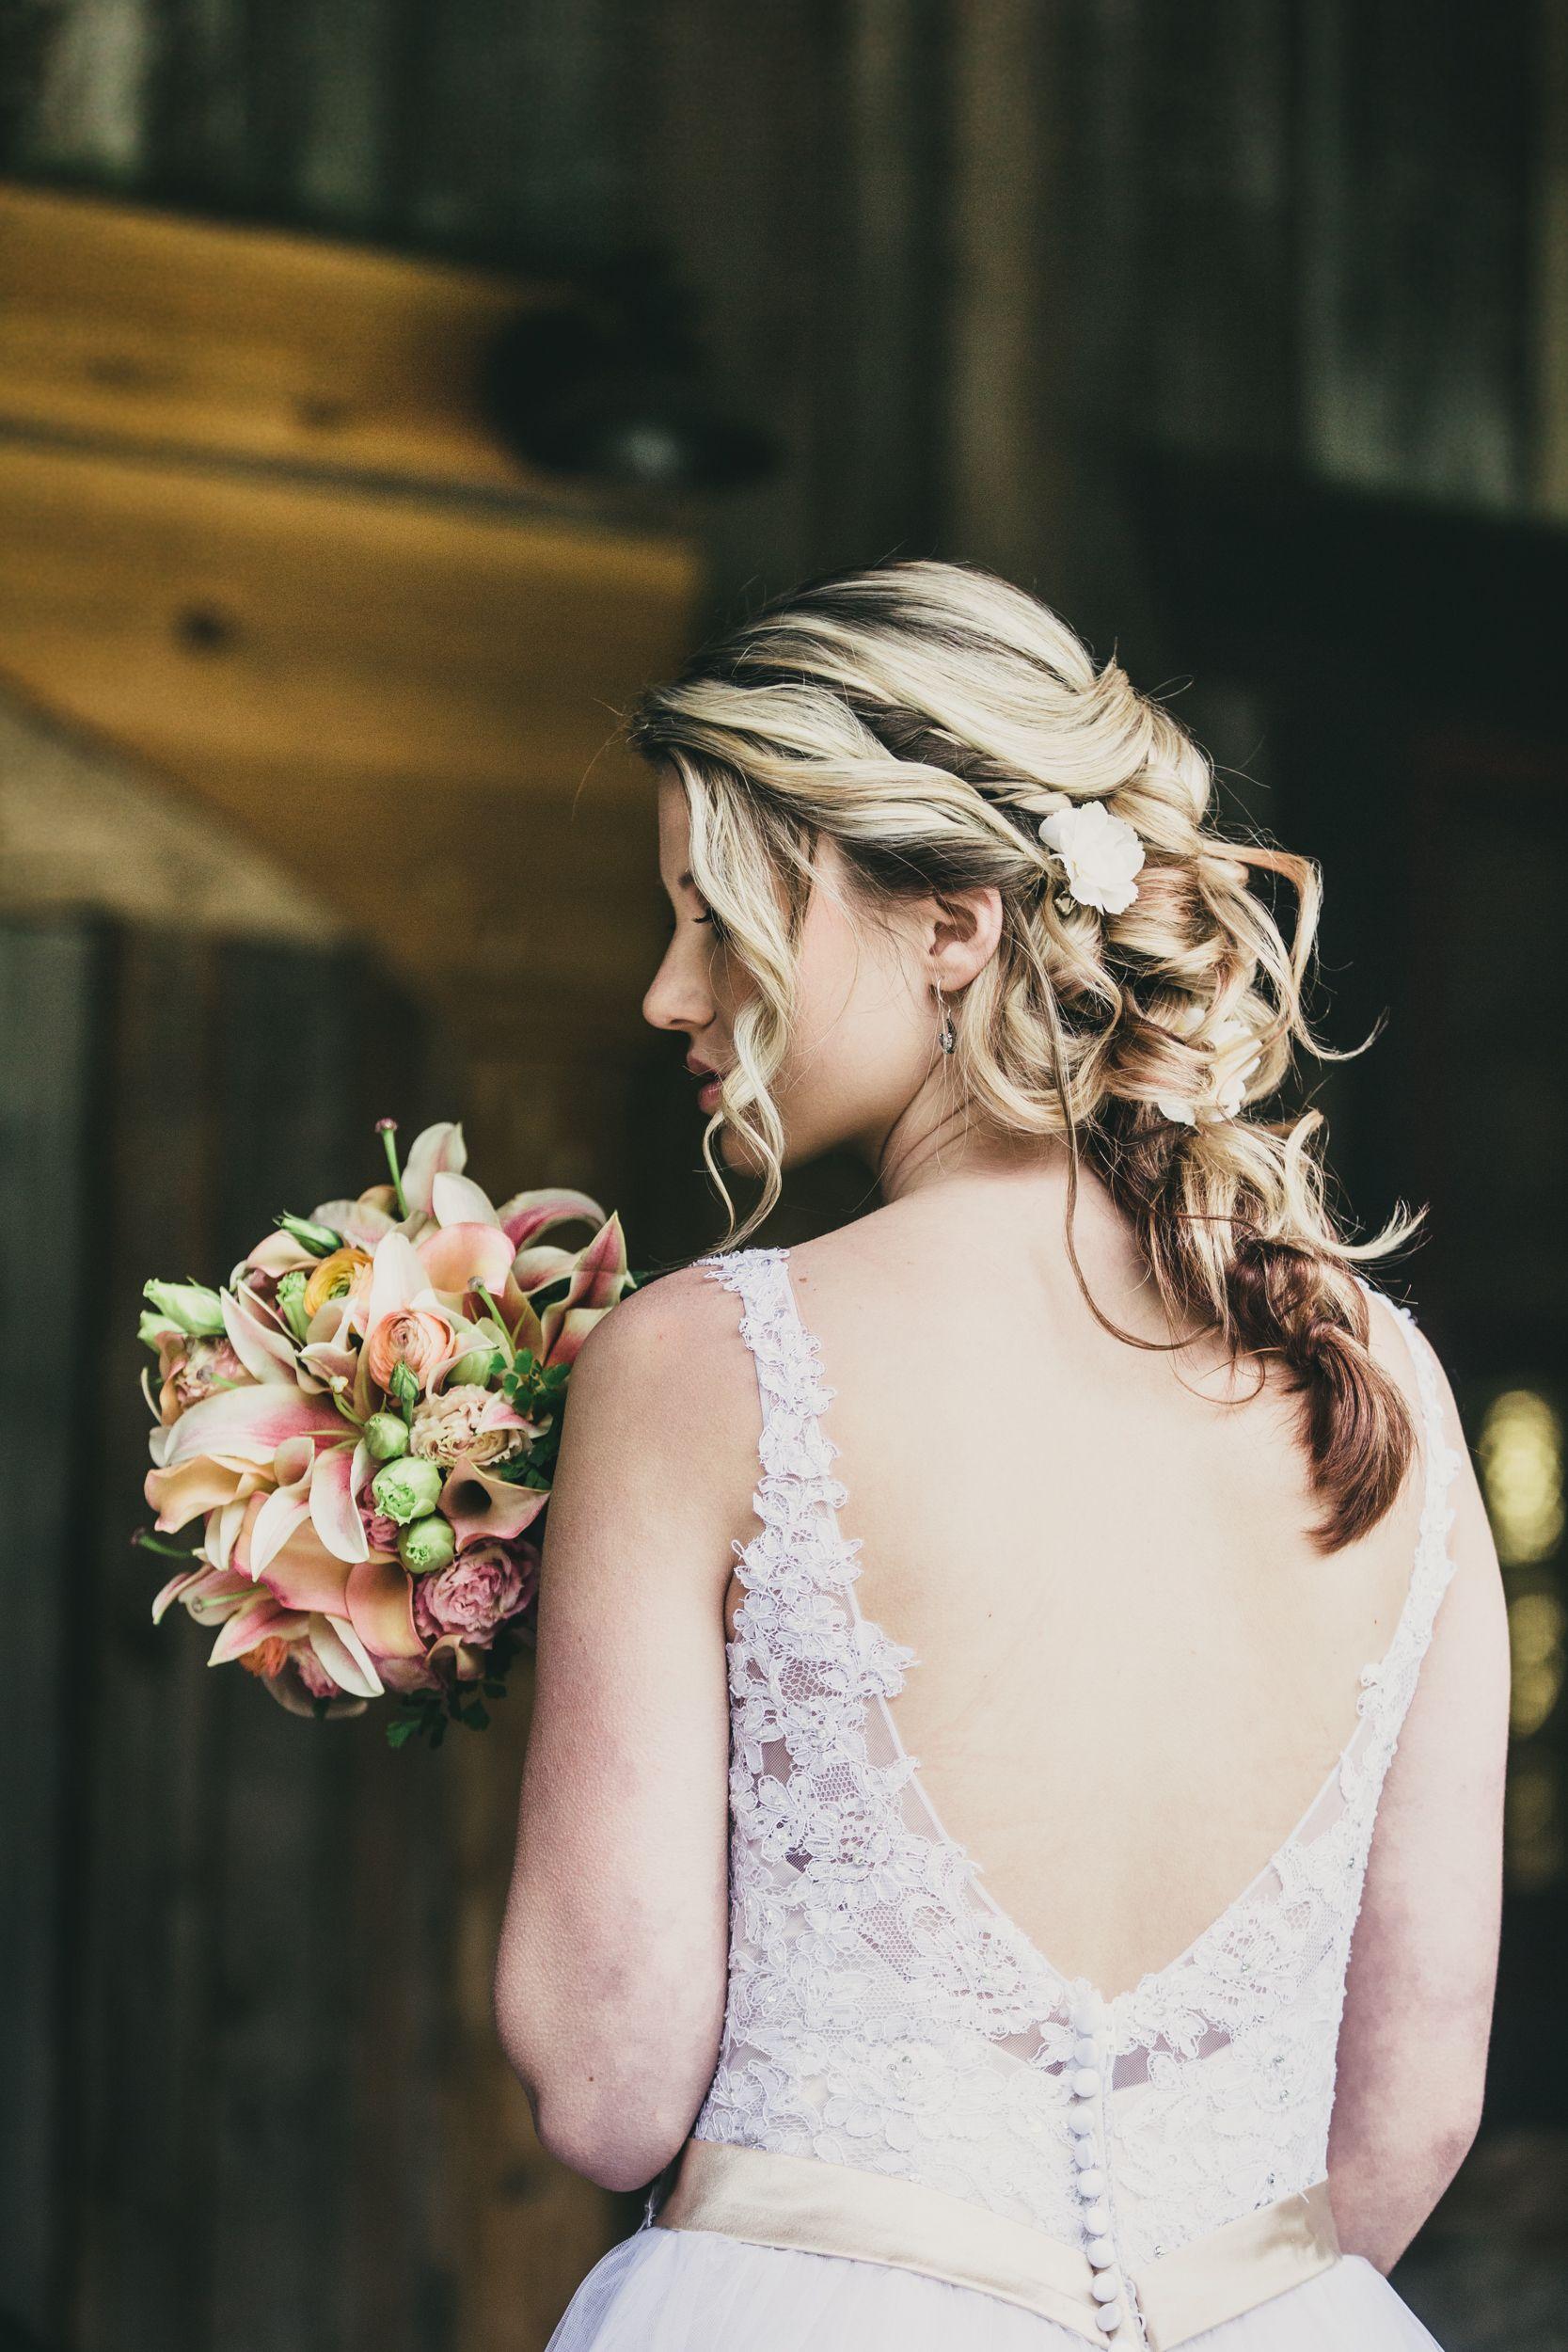 hair by ty nykole; photography by jennifer mooney